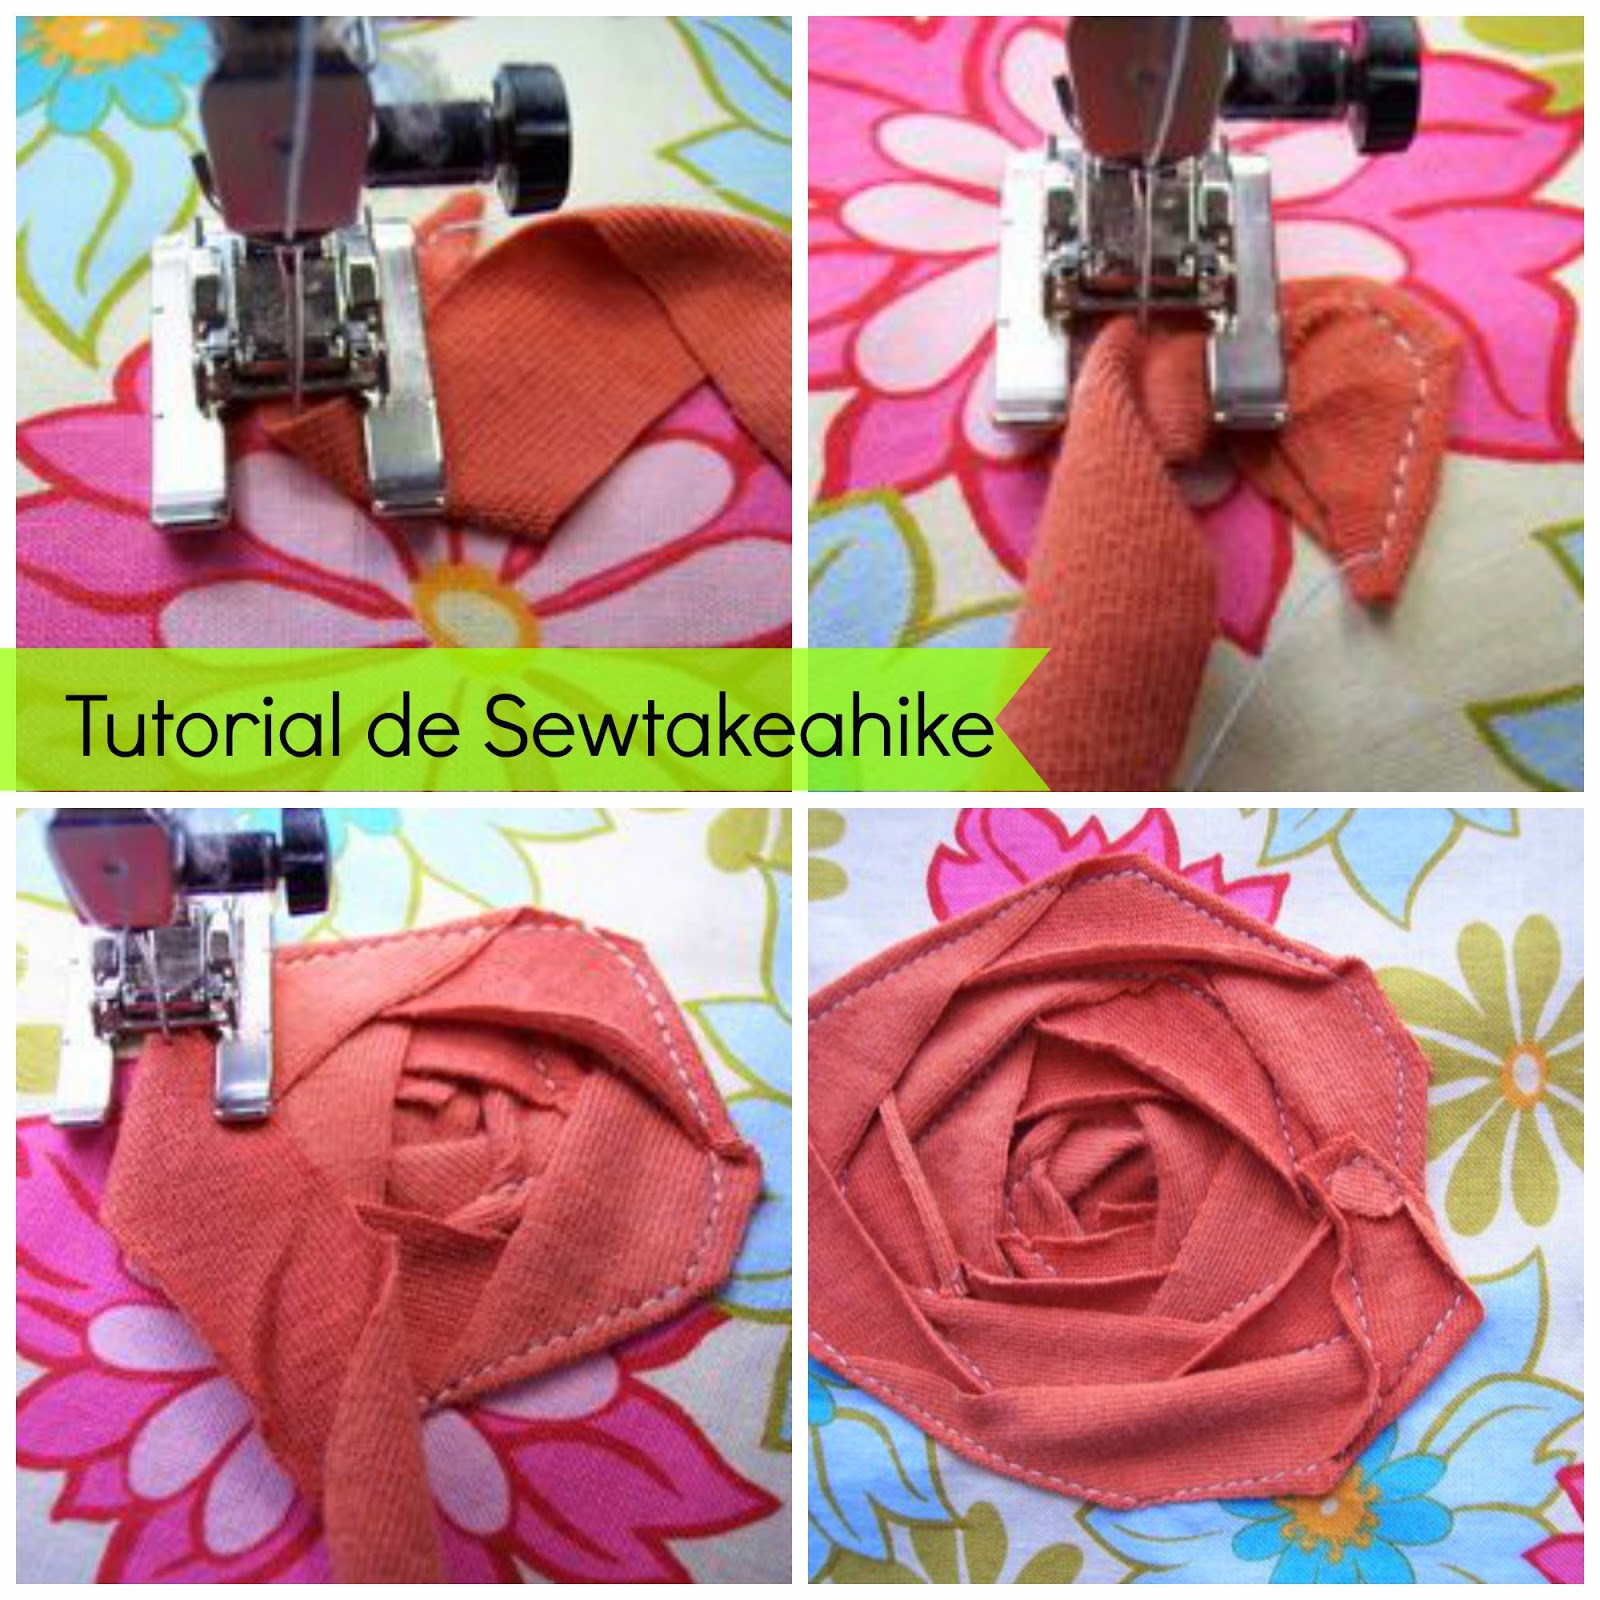 customizar, flores, camisetas, bricomoda, reciclar, remodelar